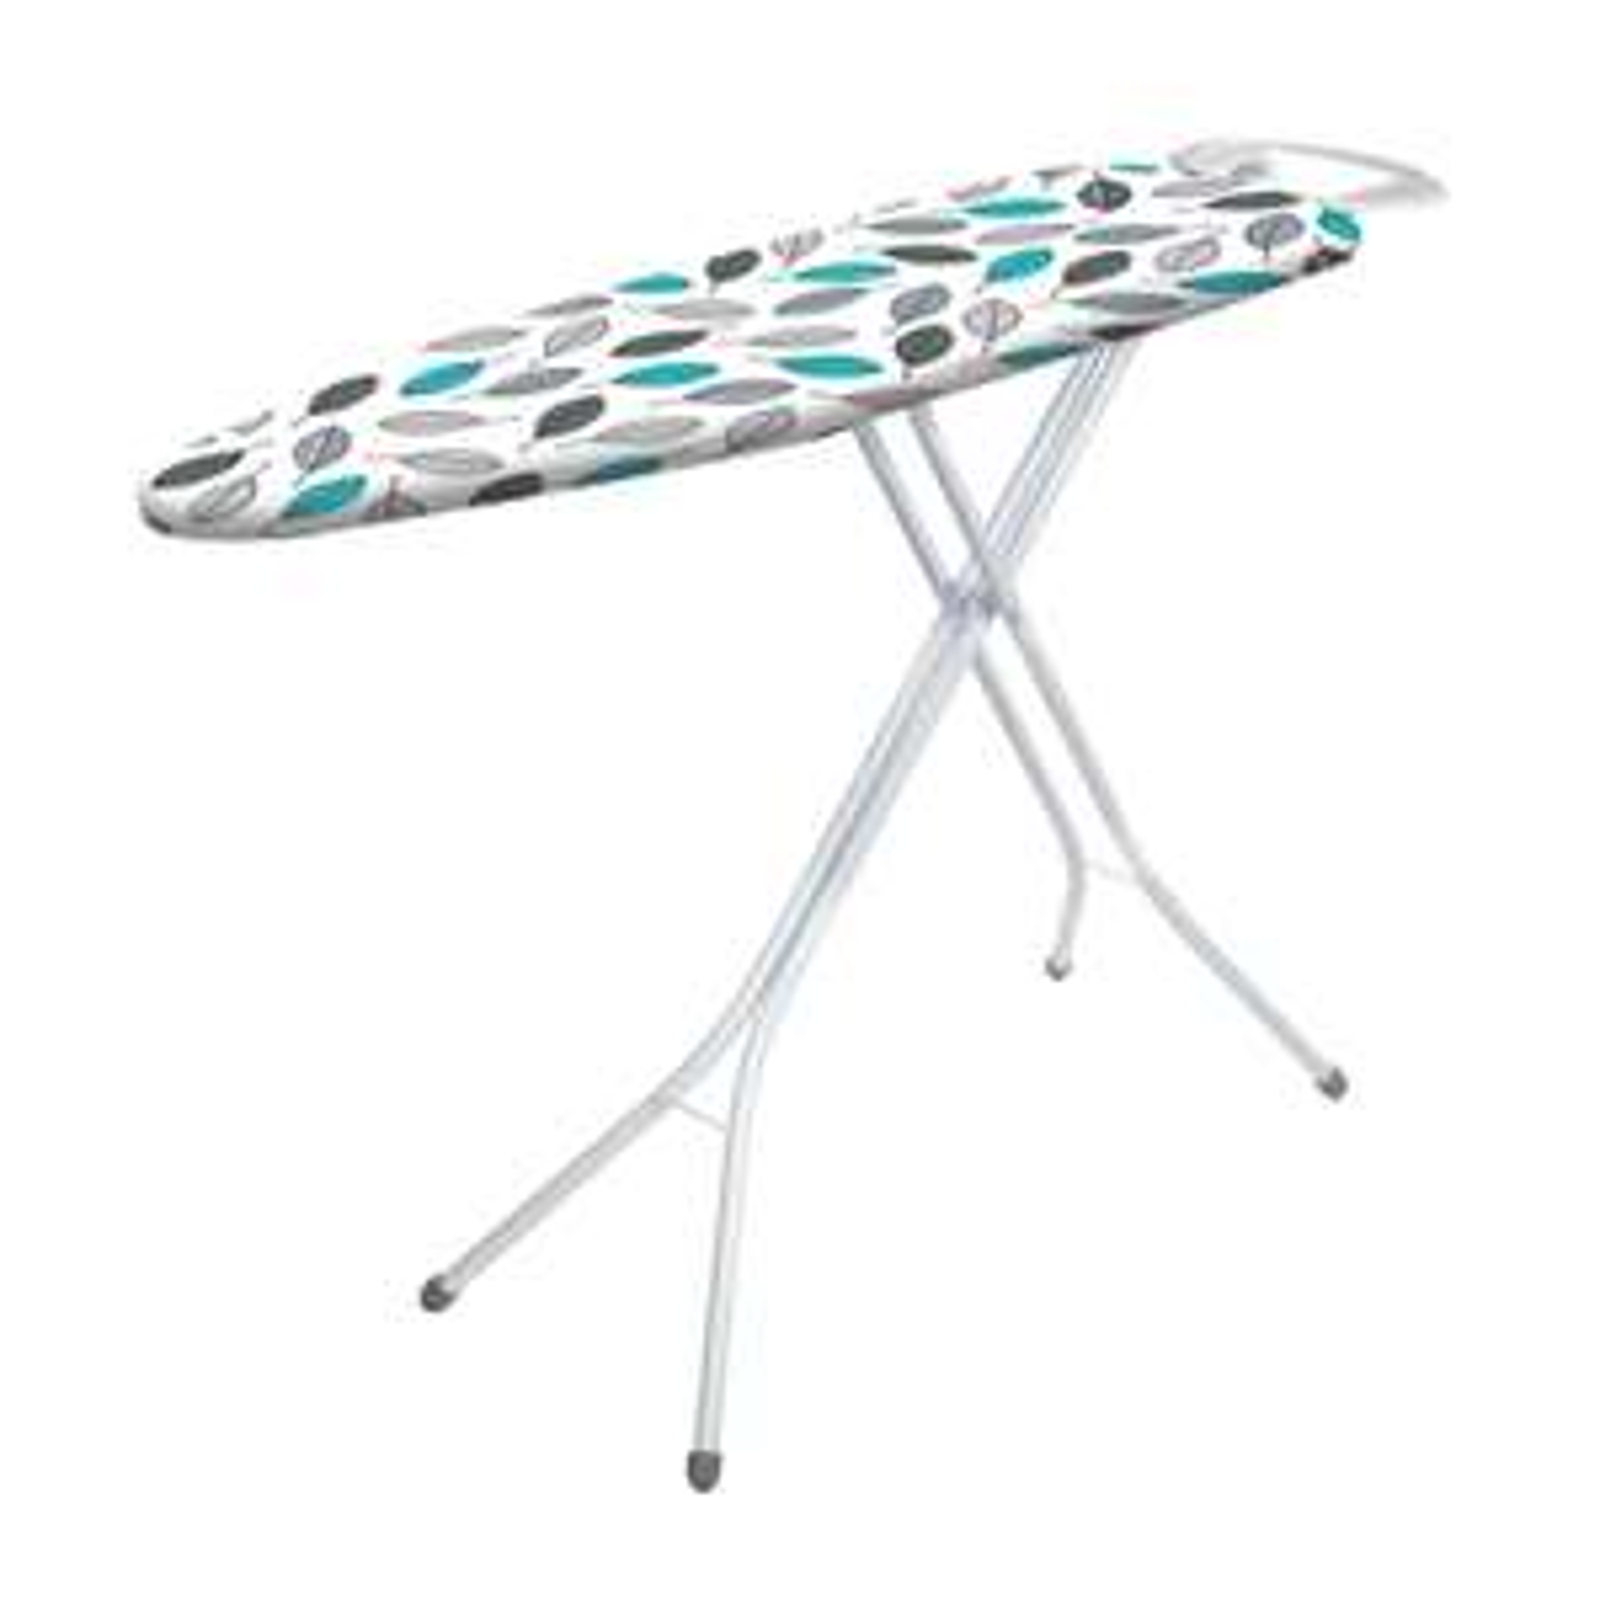 Minky Expert Ironing Board 122 x 38cm - £18.00 instore @ Asda, Birmingham